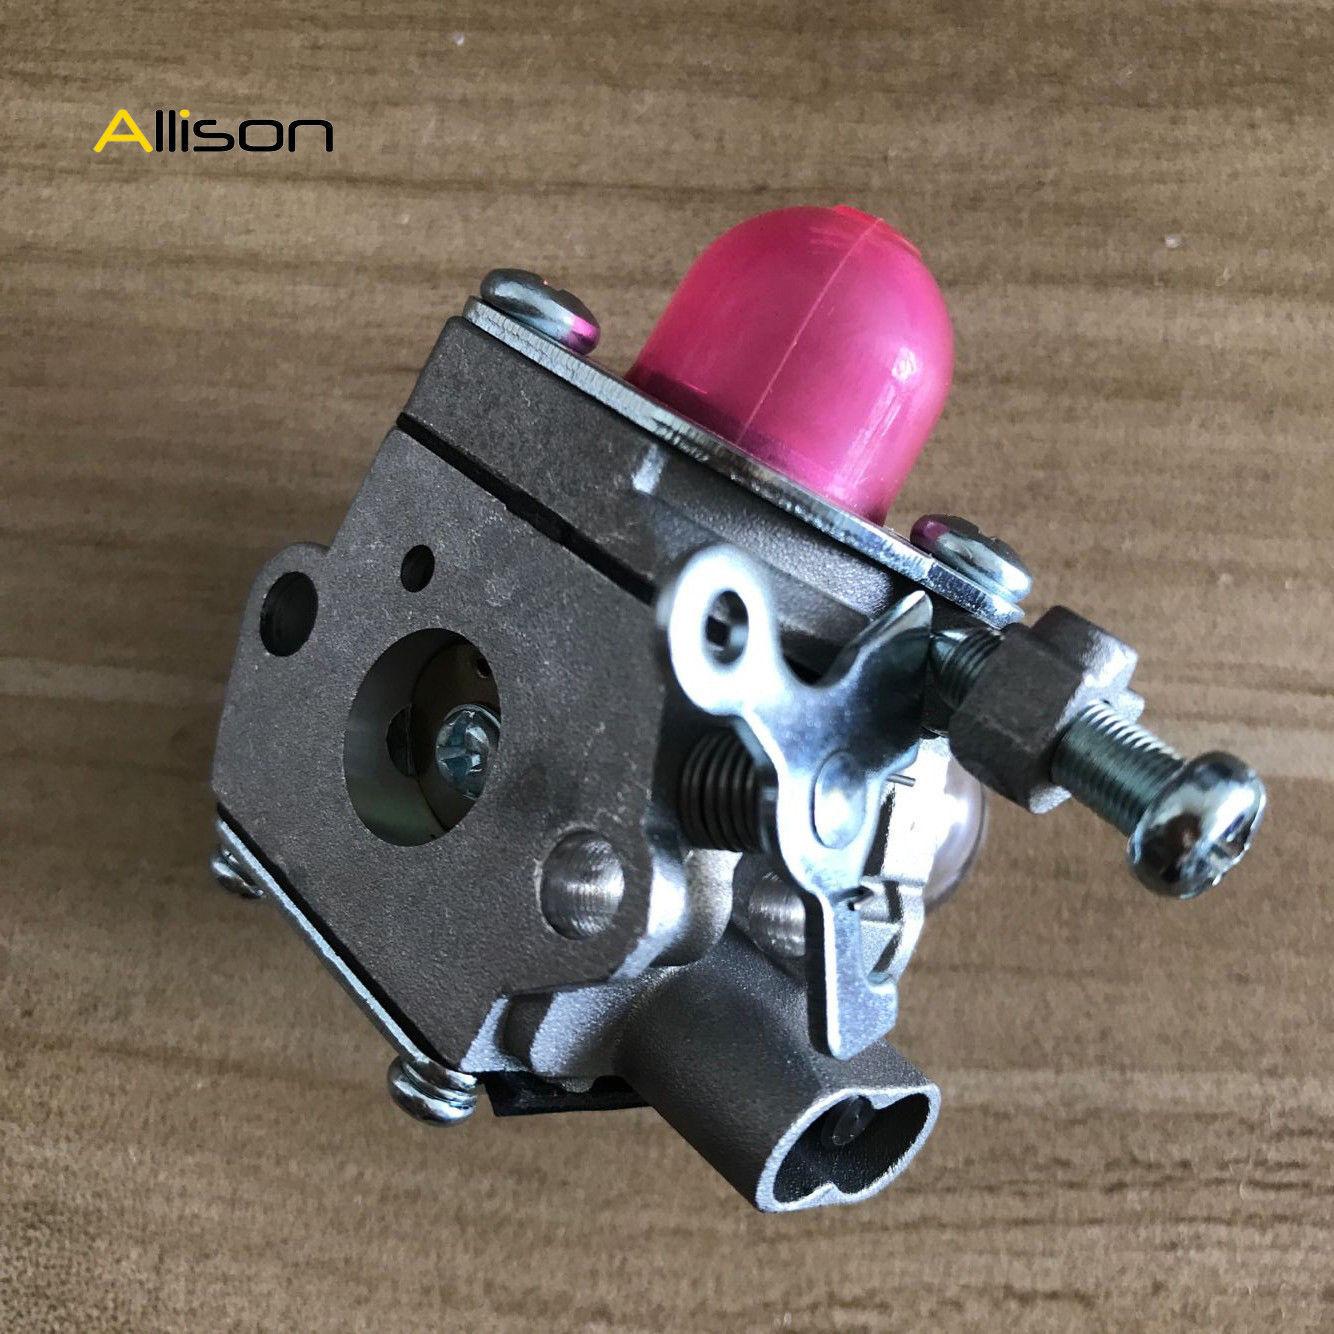 Carburetor For Cub Cadet BC210 BC280 CC212 CS202 SS270 string trimmer Air filter image 4